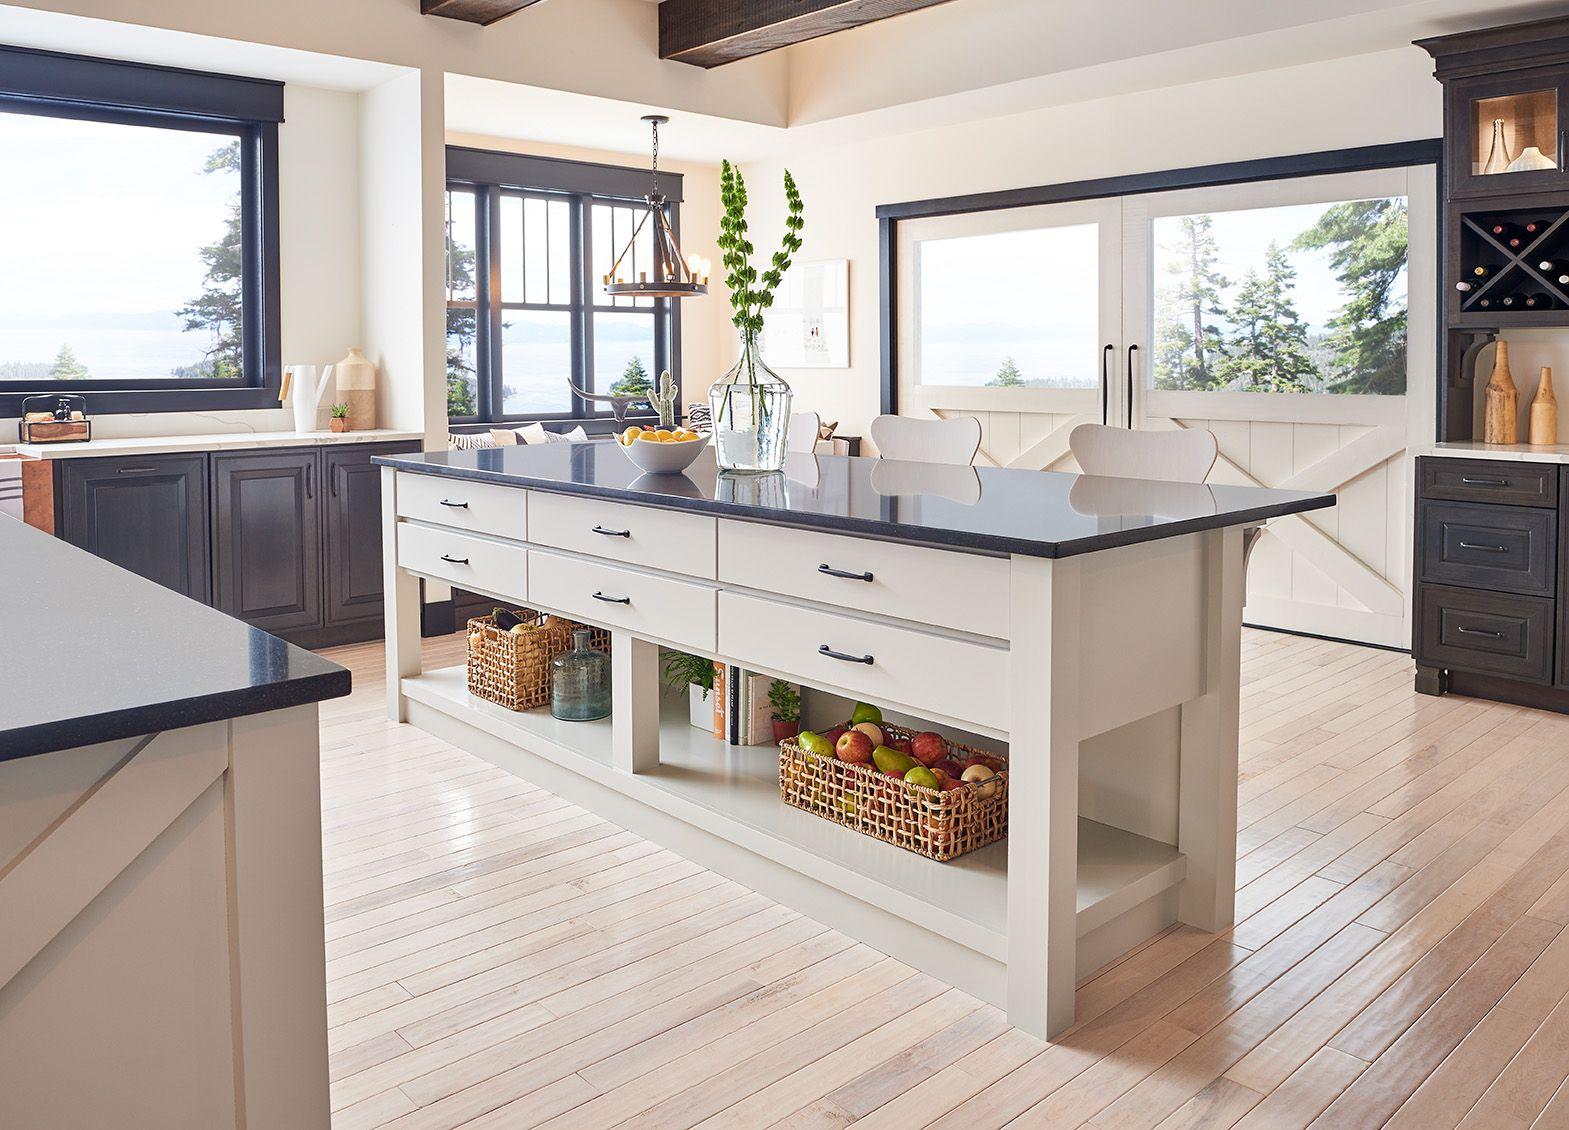 Waypoint Custom Cabinets Cherry Slate Builders Surplus Located In Louisville Ky Or Newport K Kitchen Remodel Design Functional Kitchen Design Kitchen Remodel